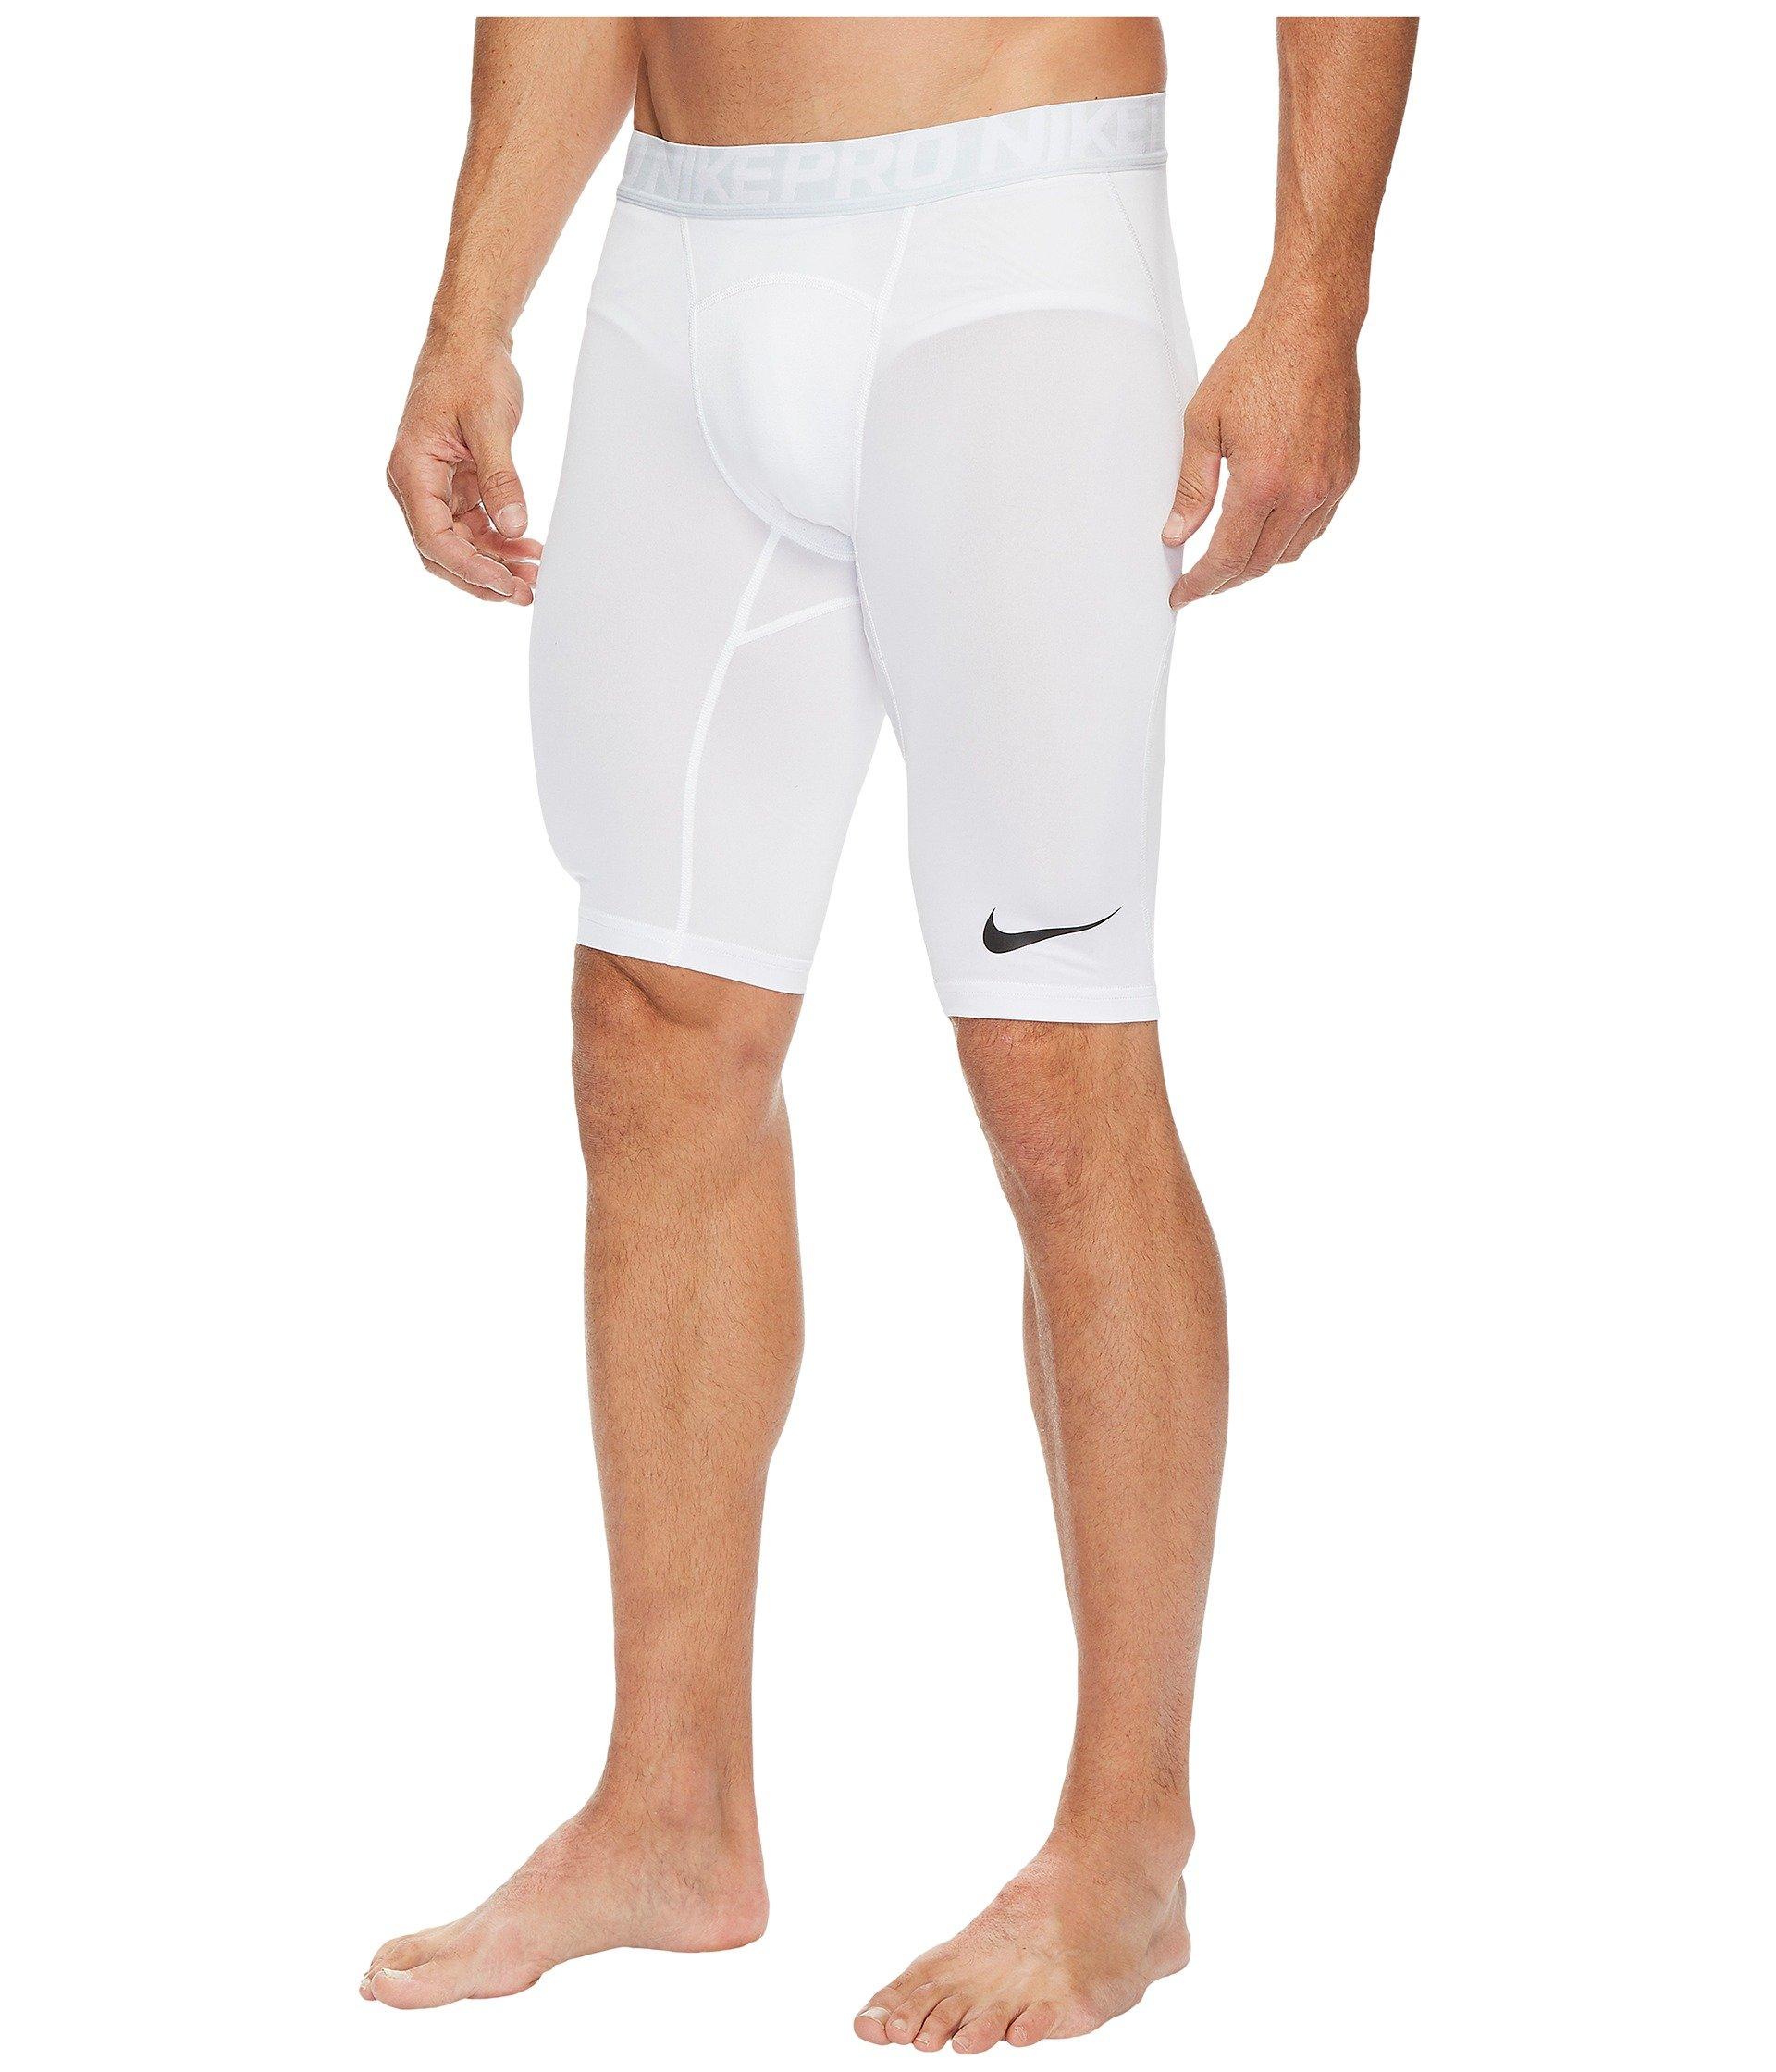 Nike Men's Pro Training Shorts, White/Pure Platinum/Black, Small by Nike (Image #3)